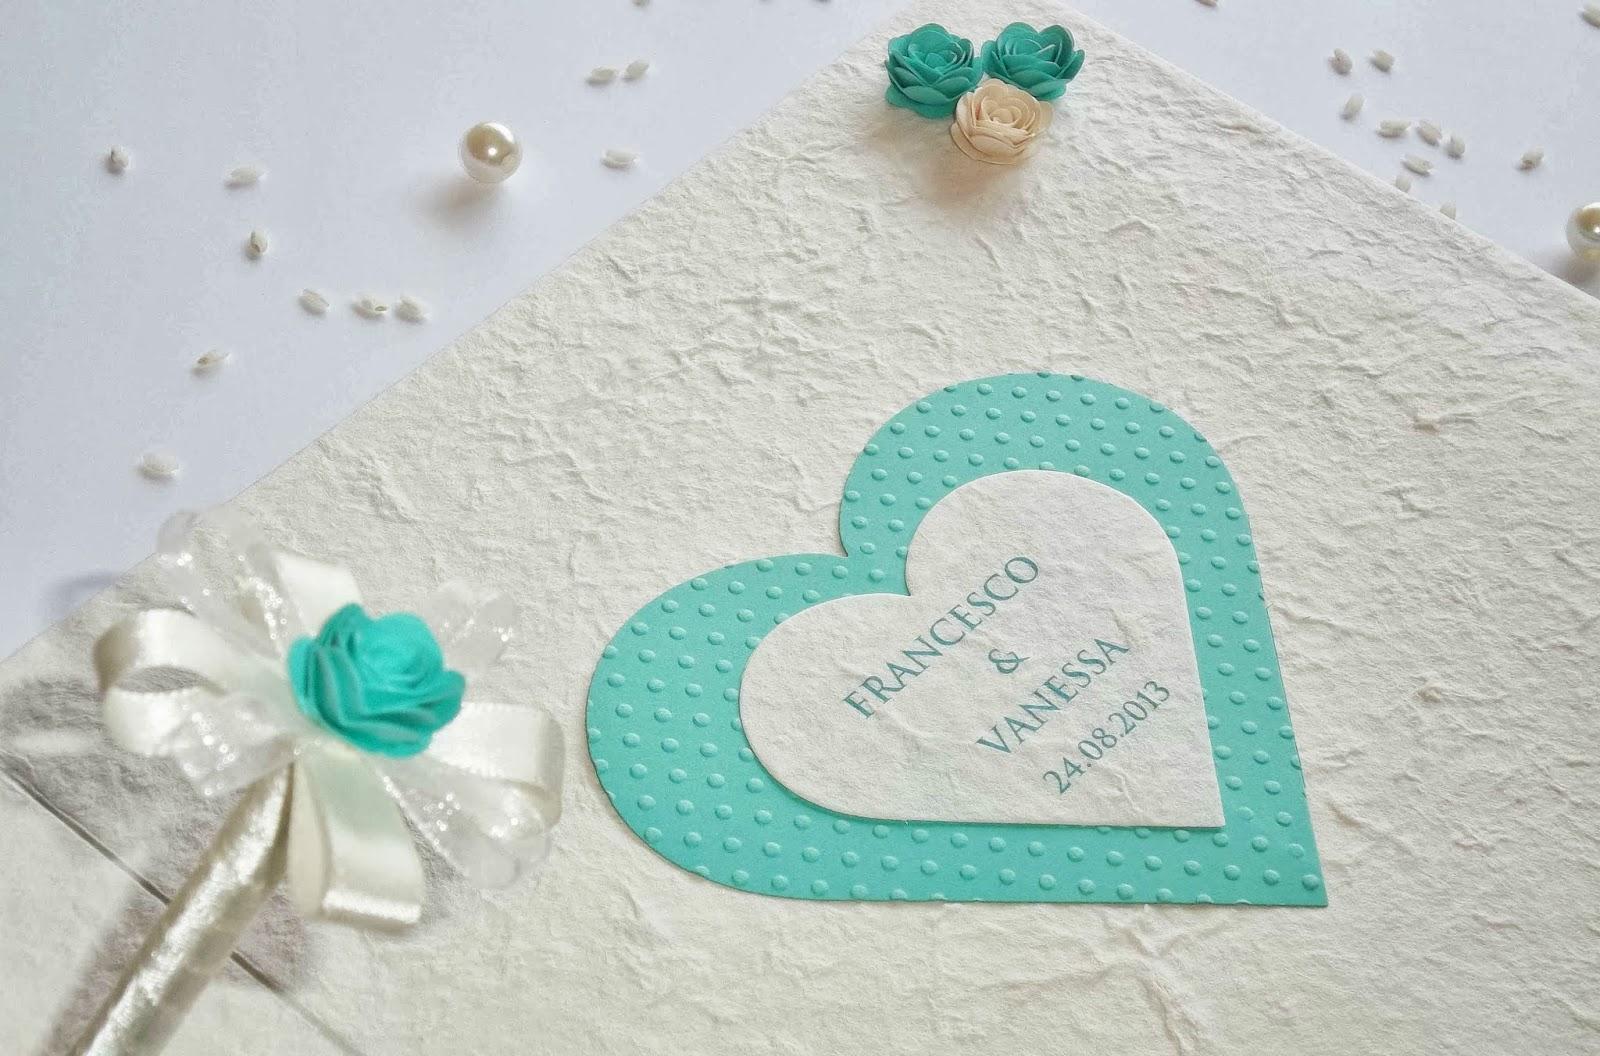 Matrimonio Tema Azzurro : Sara crea matrimonio color tiffany guestbook a tema